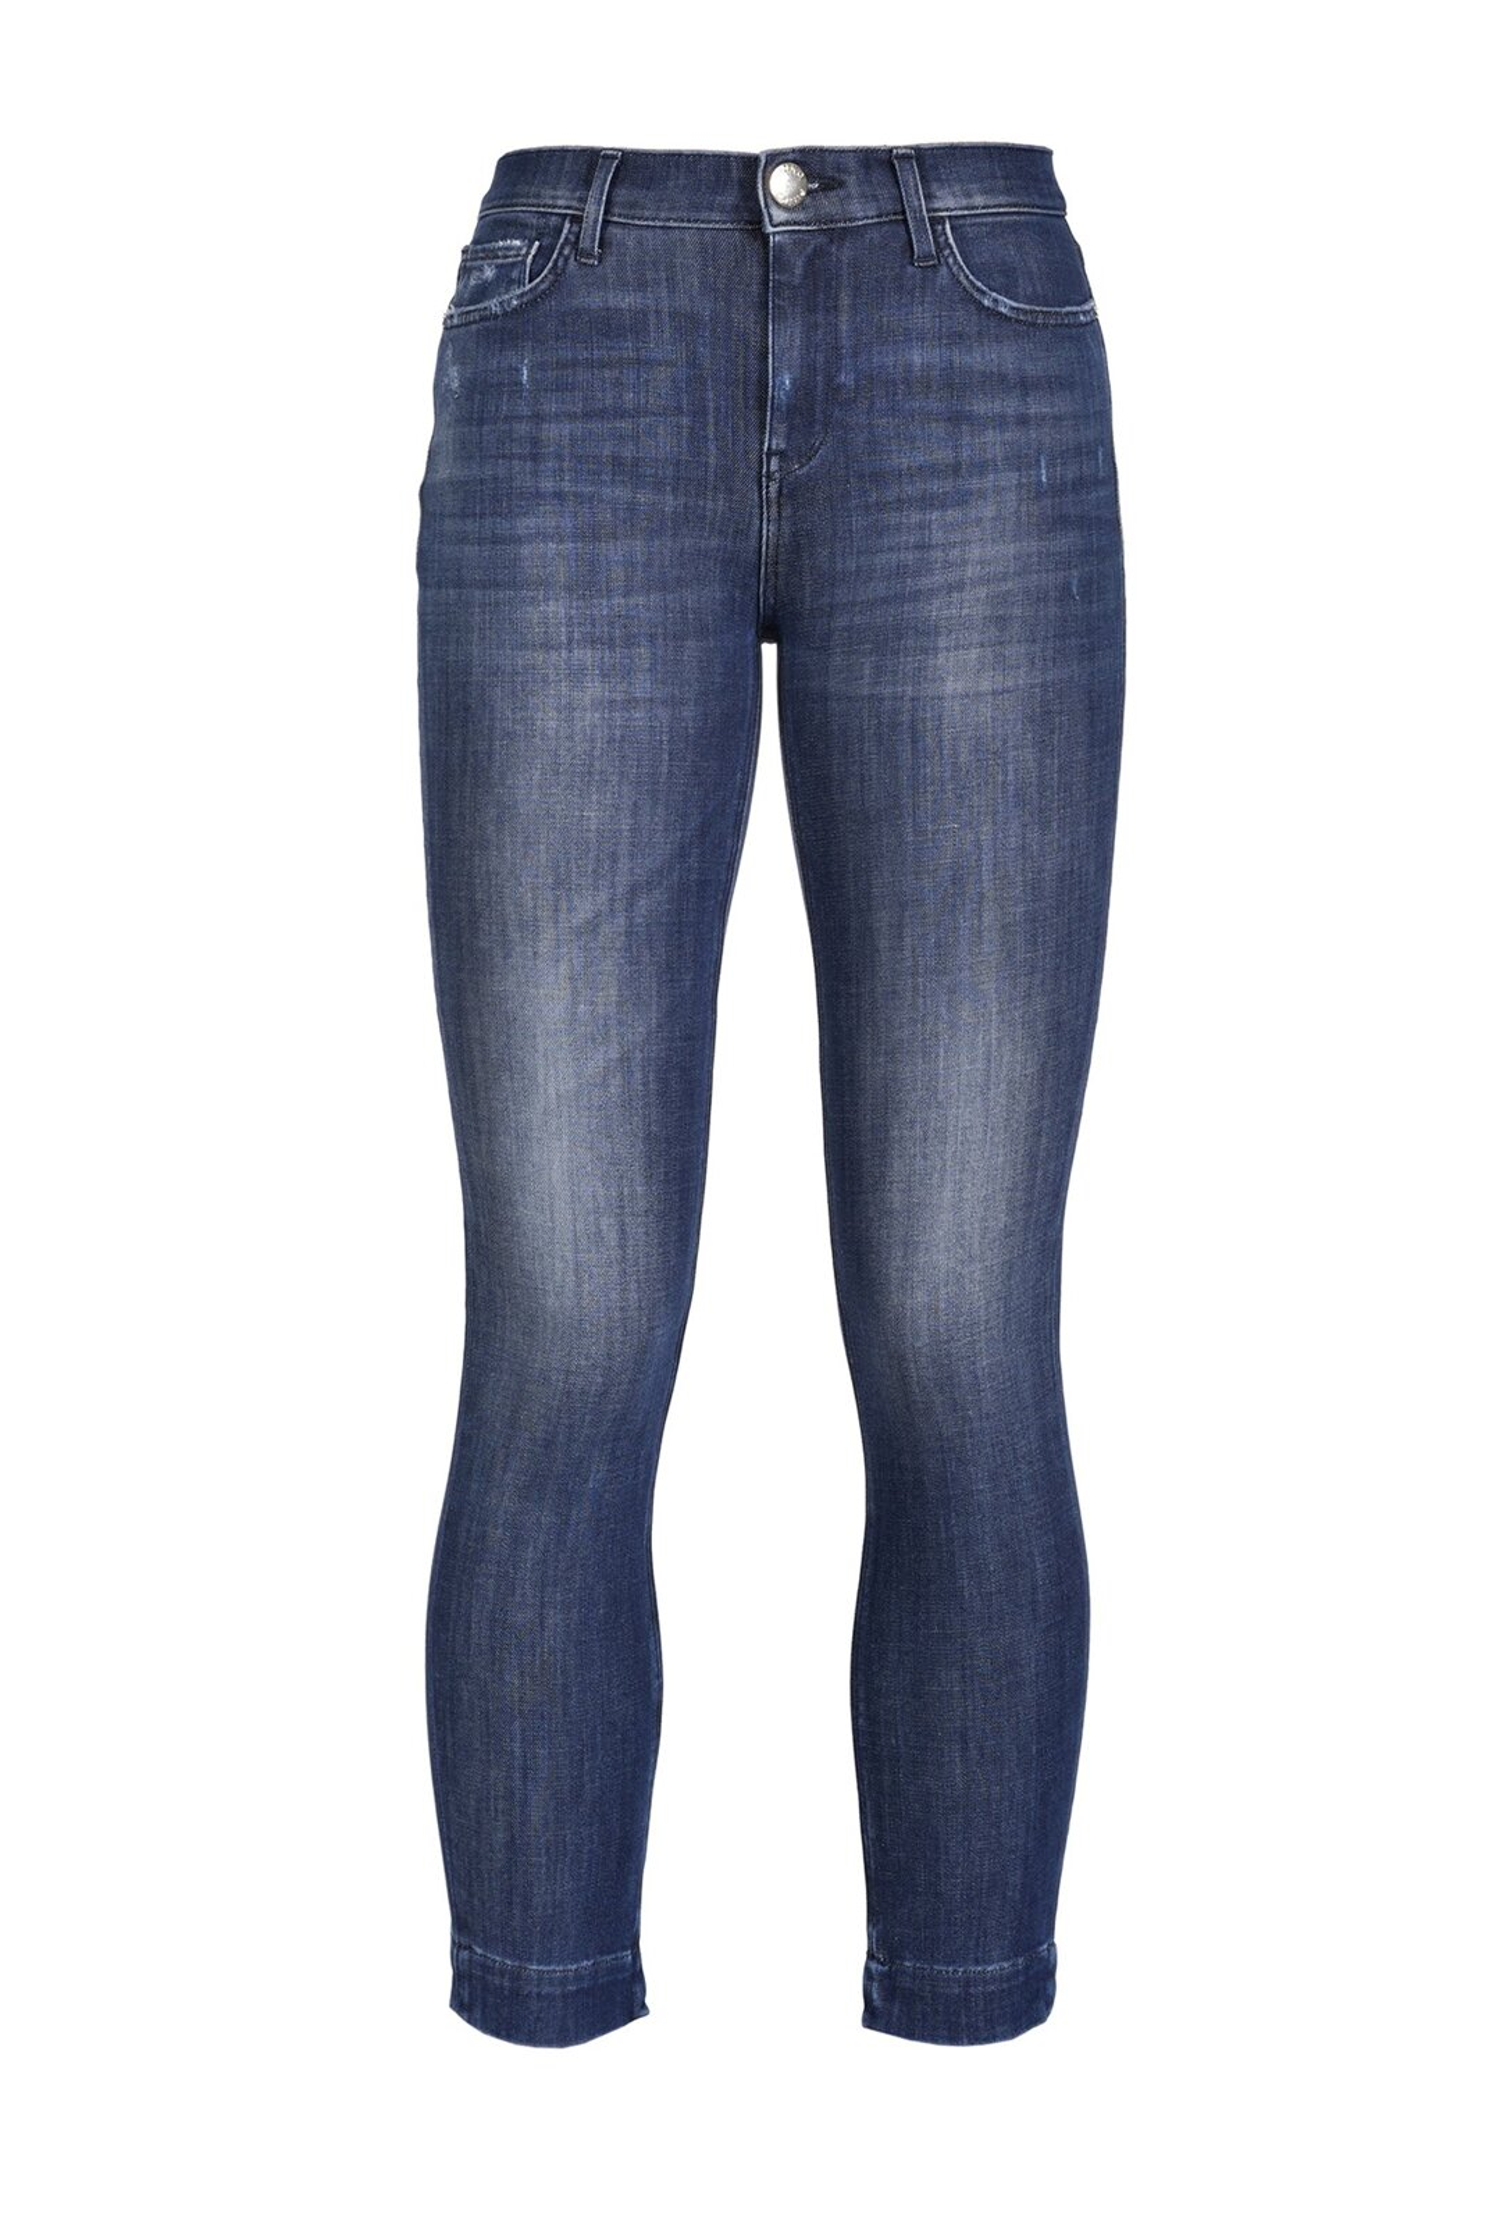 Jeans Skinny In Denim Bistretch - Pinko